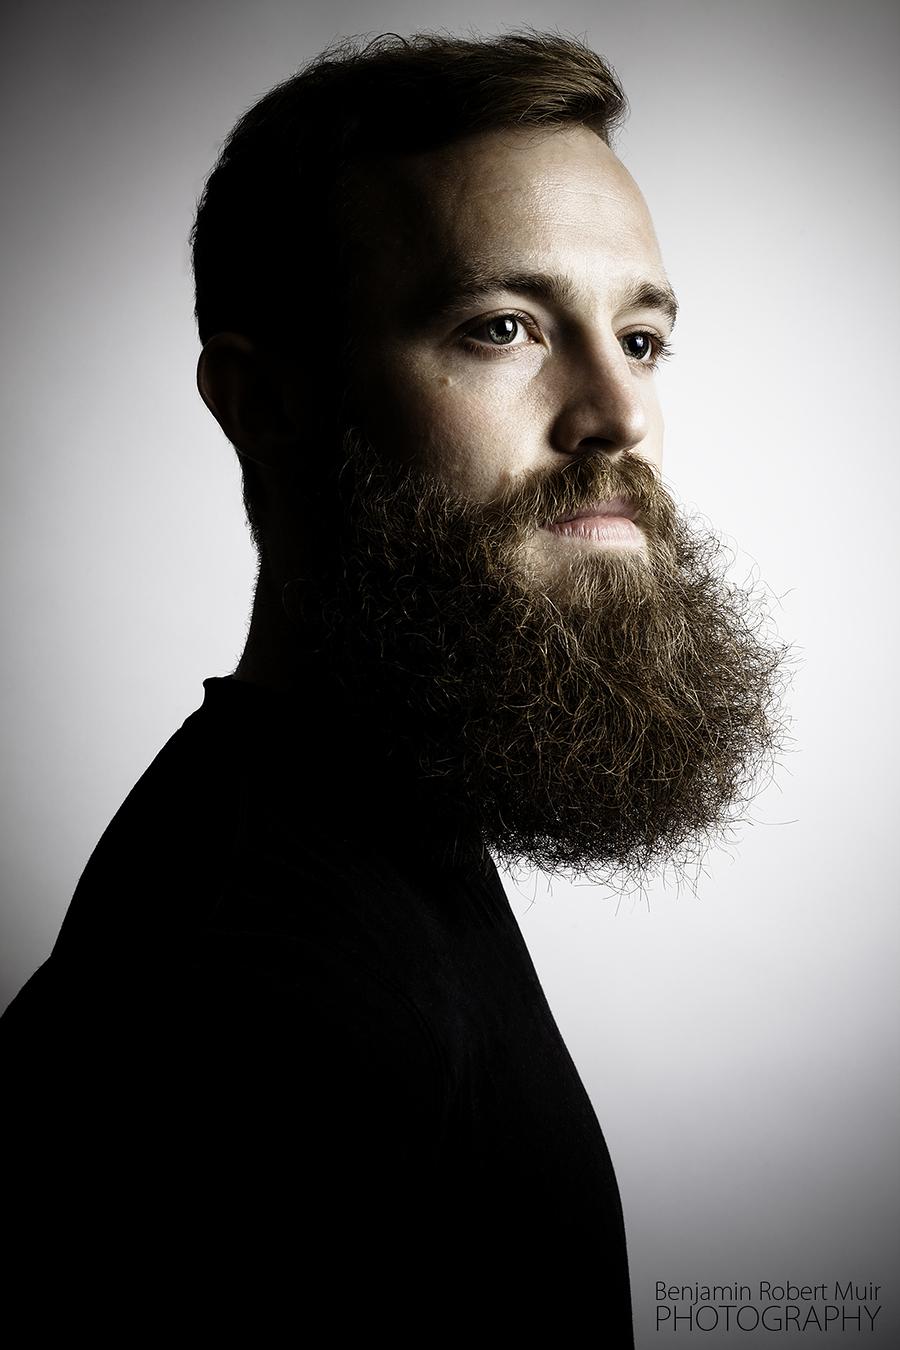 The Beard / Photography by Benjamin Robert Muir / Uploaded 4th August 2015 @ 11:40 AM